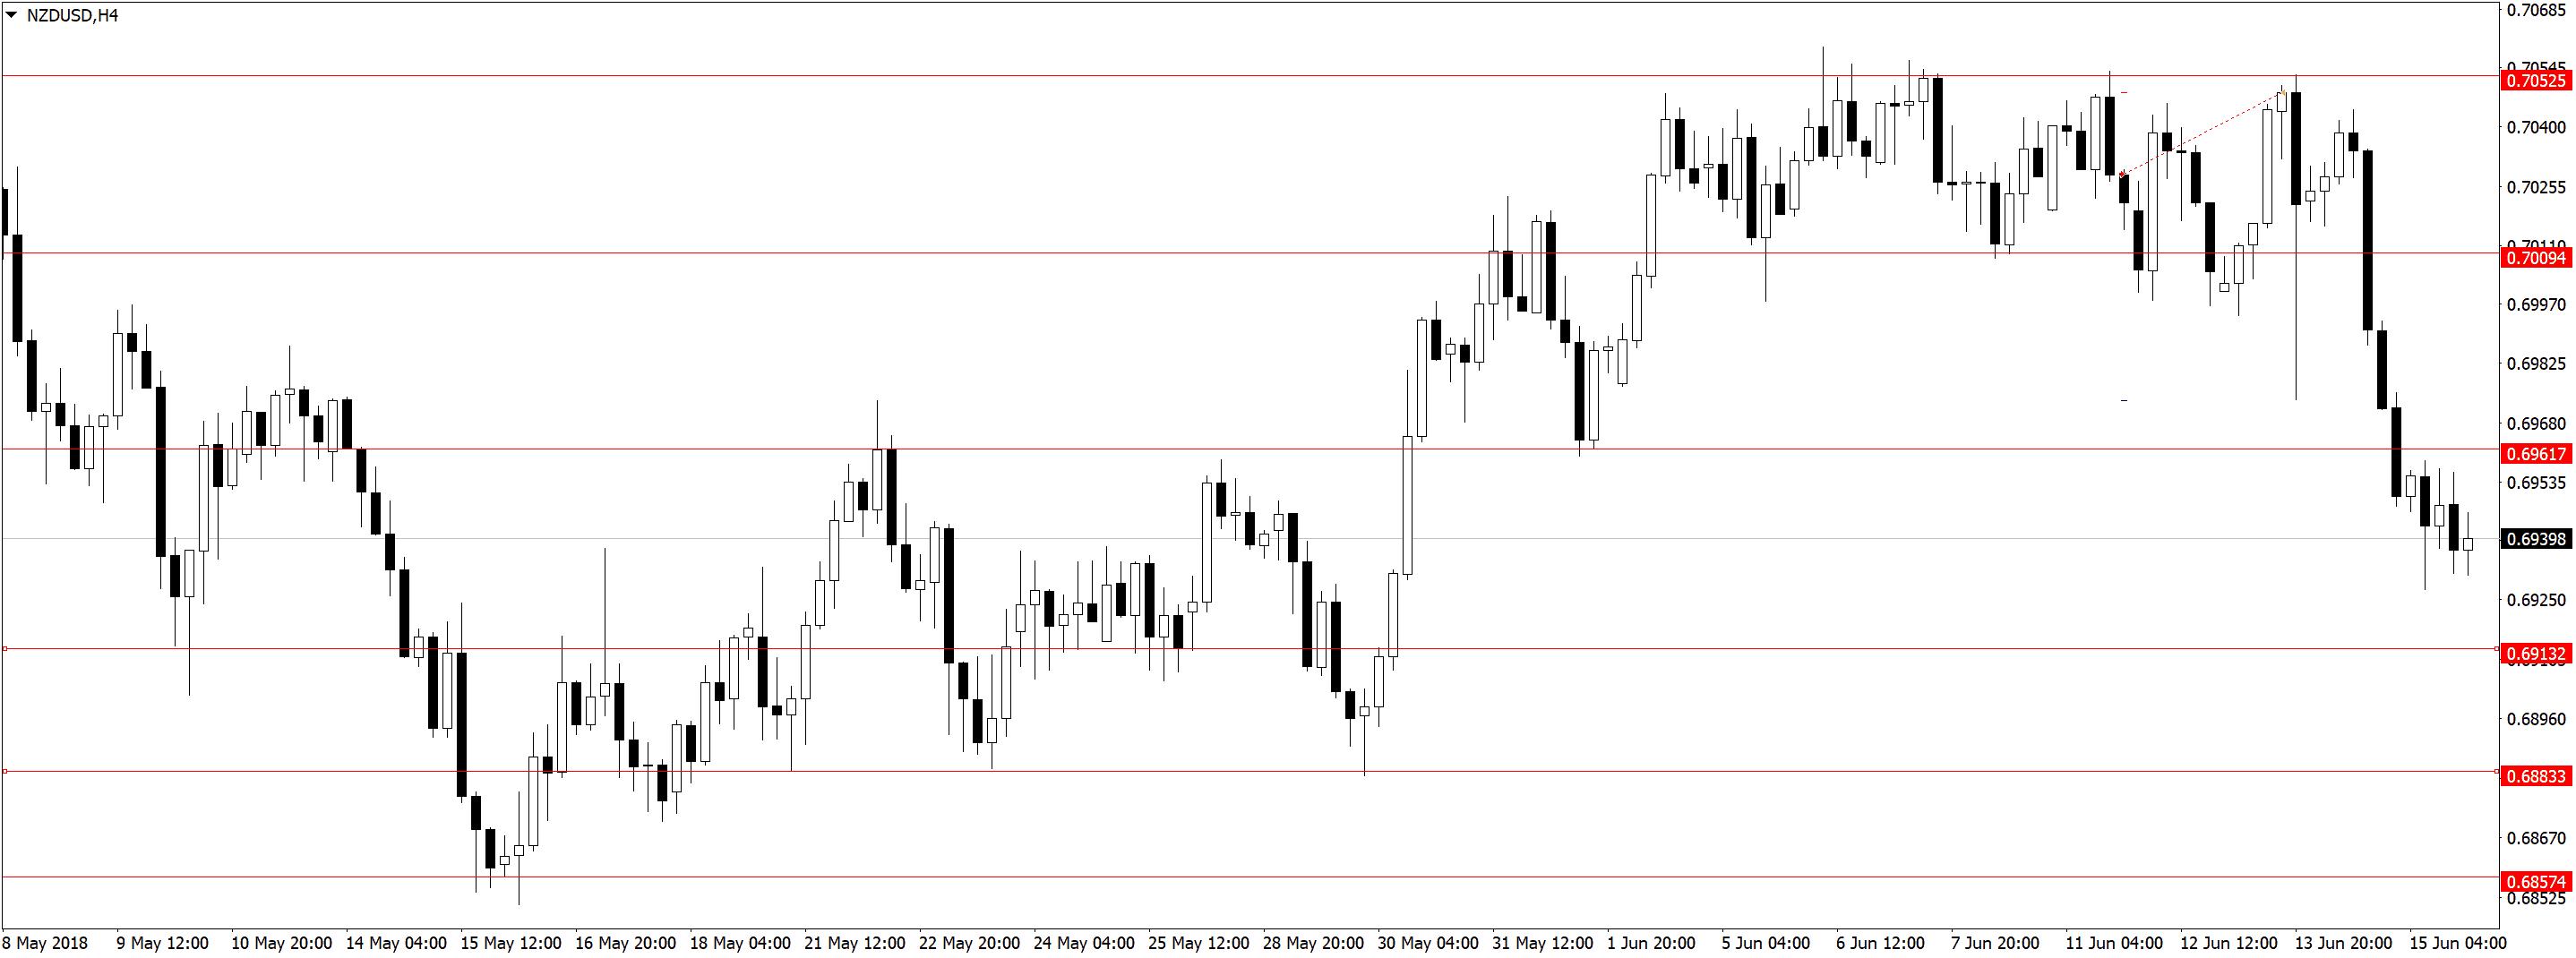 NZDUSDH4 Усталость от трейдинга, торговля акций, переторговка